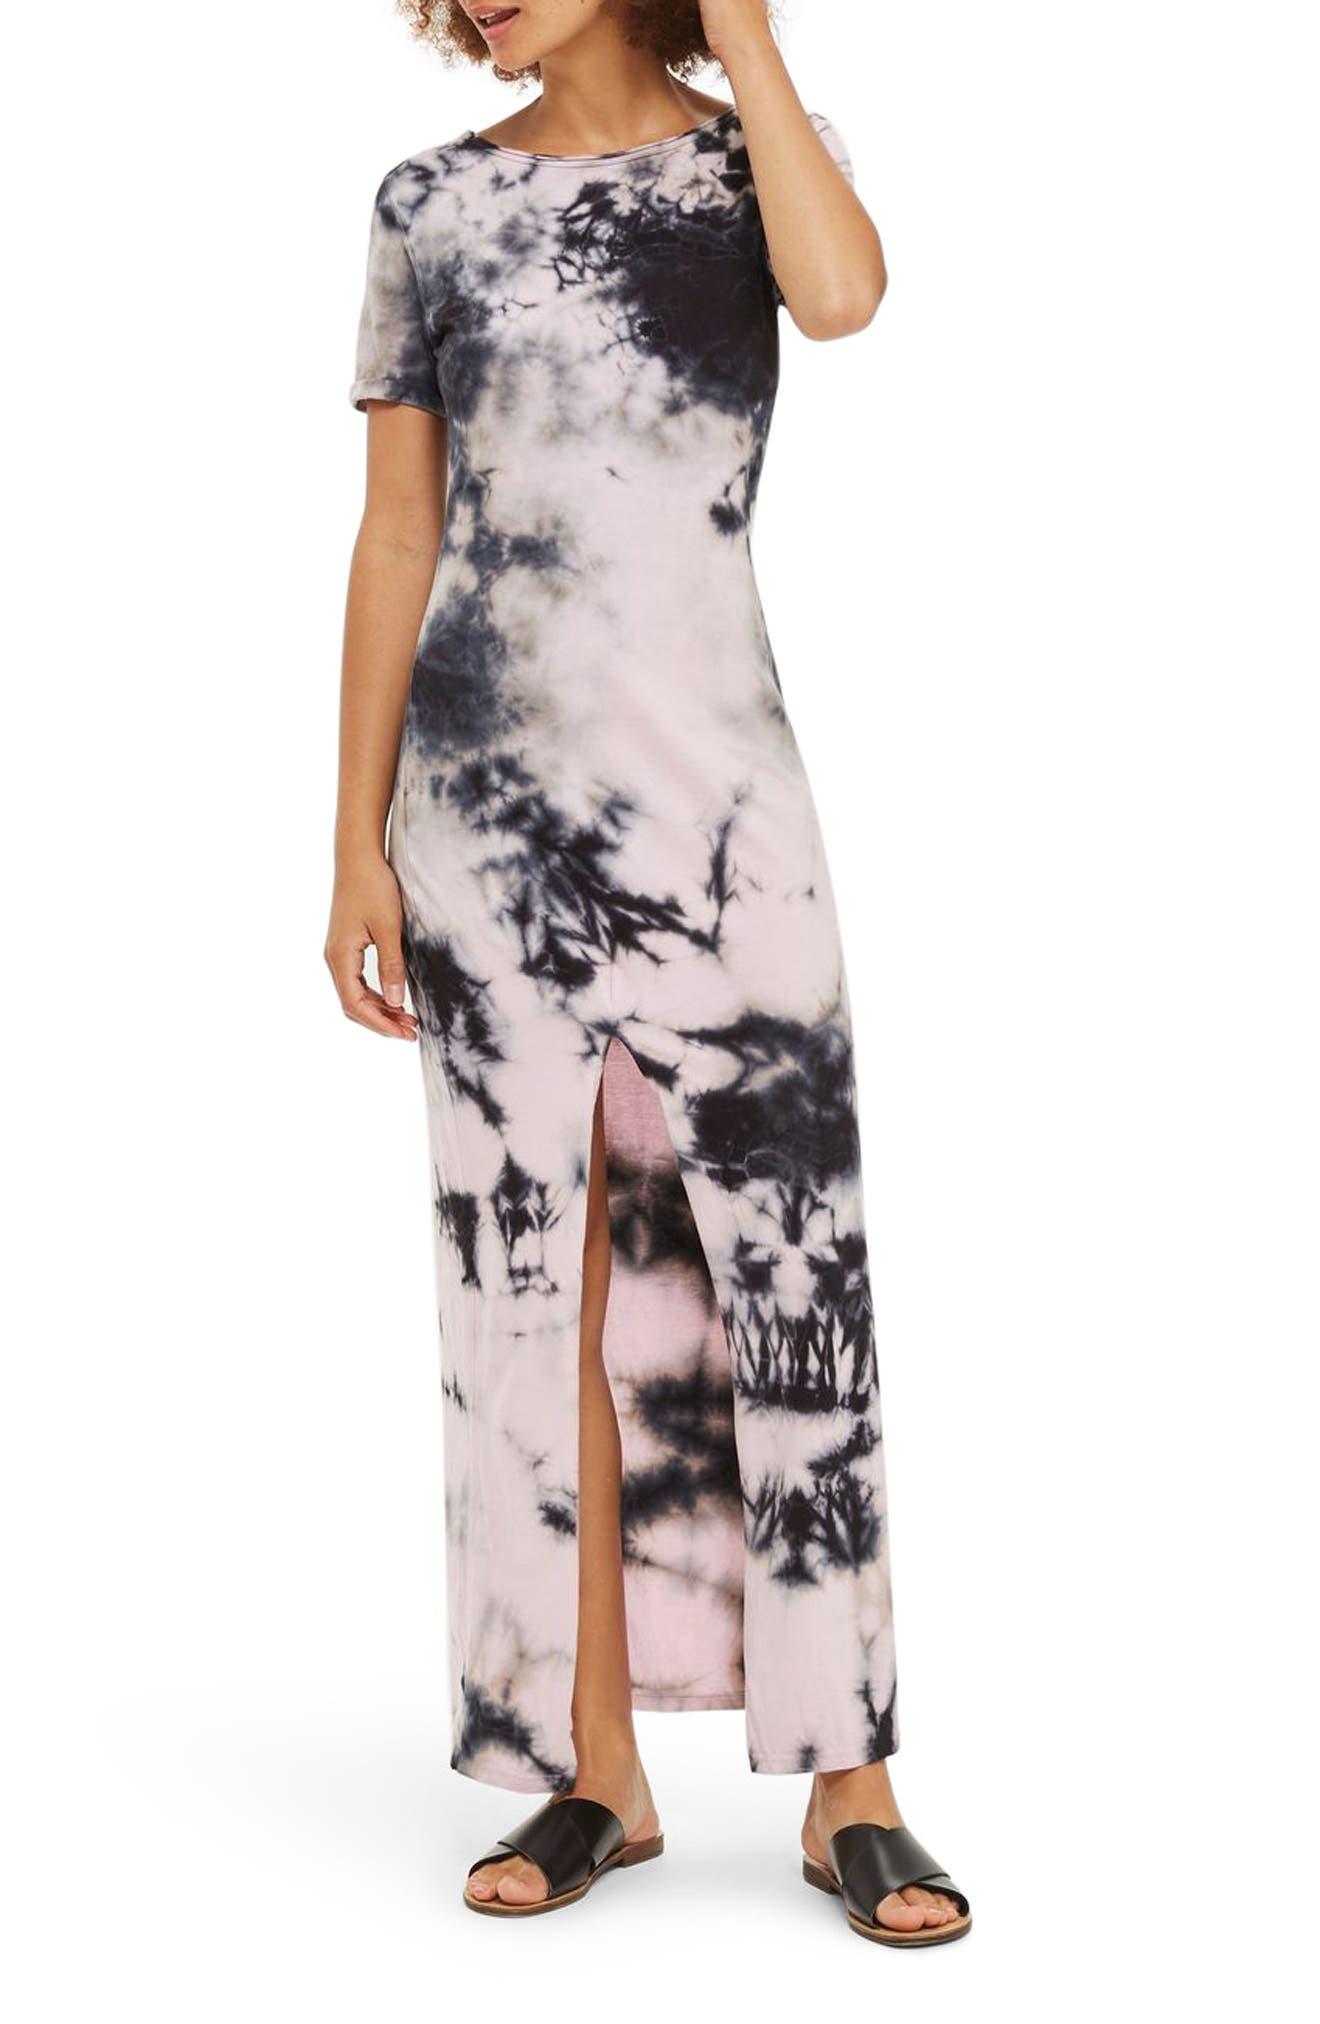 Topshop Tie Dye Lace-Up Back Maxi Dress